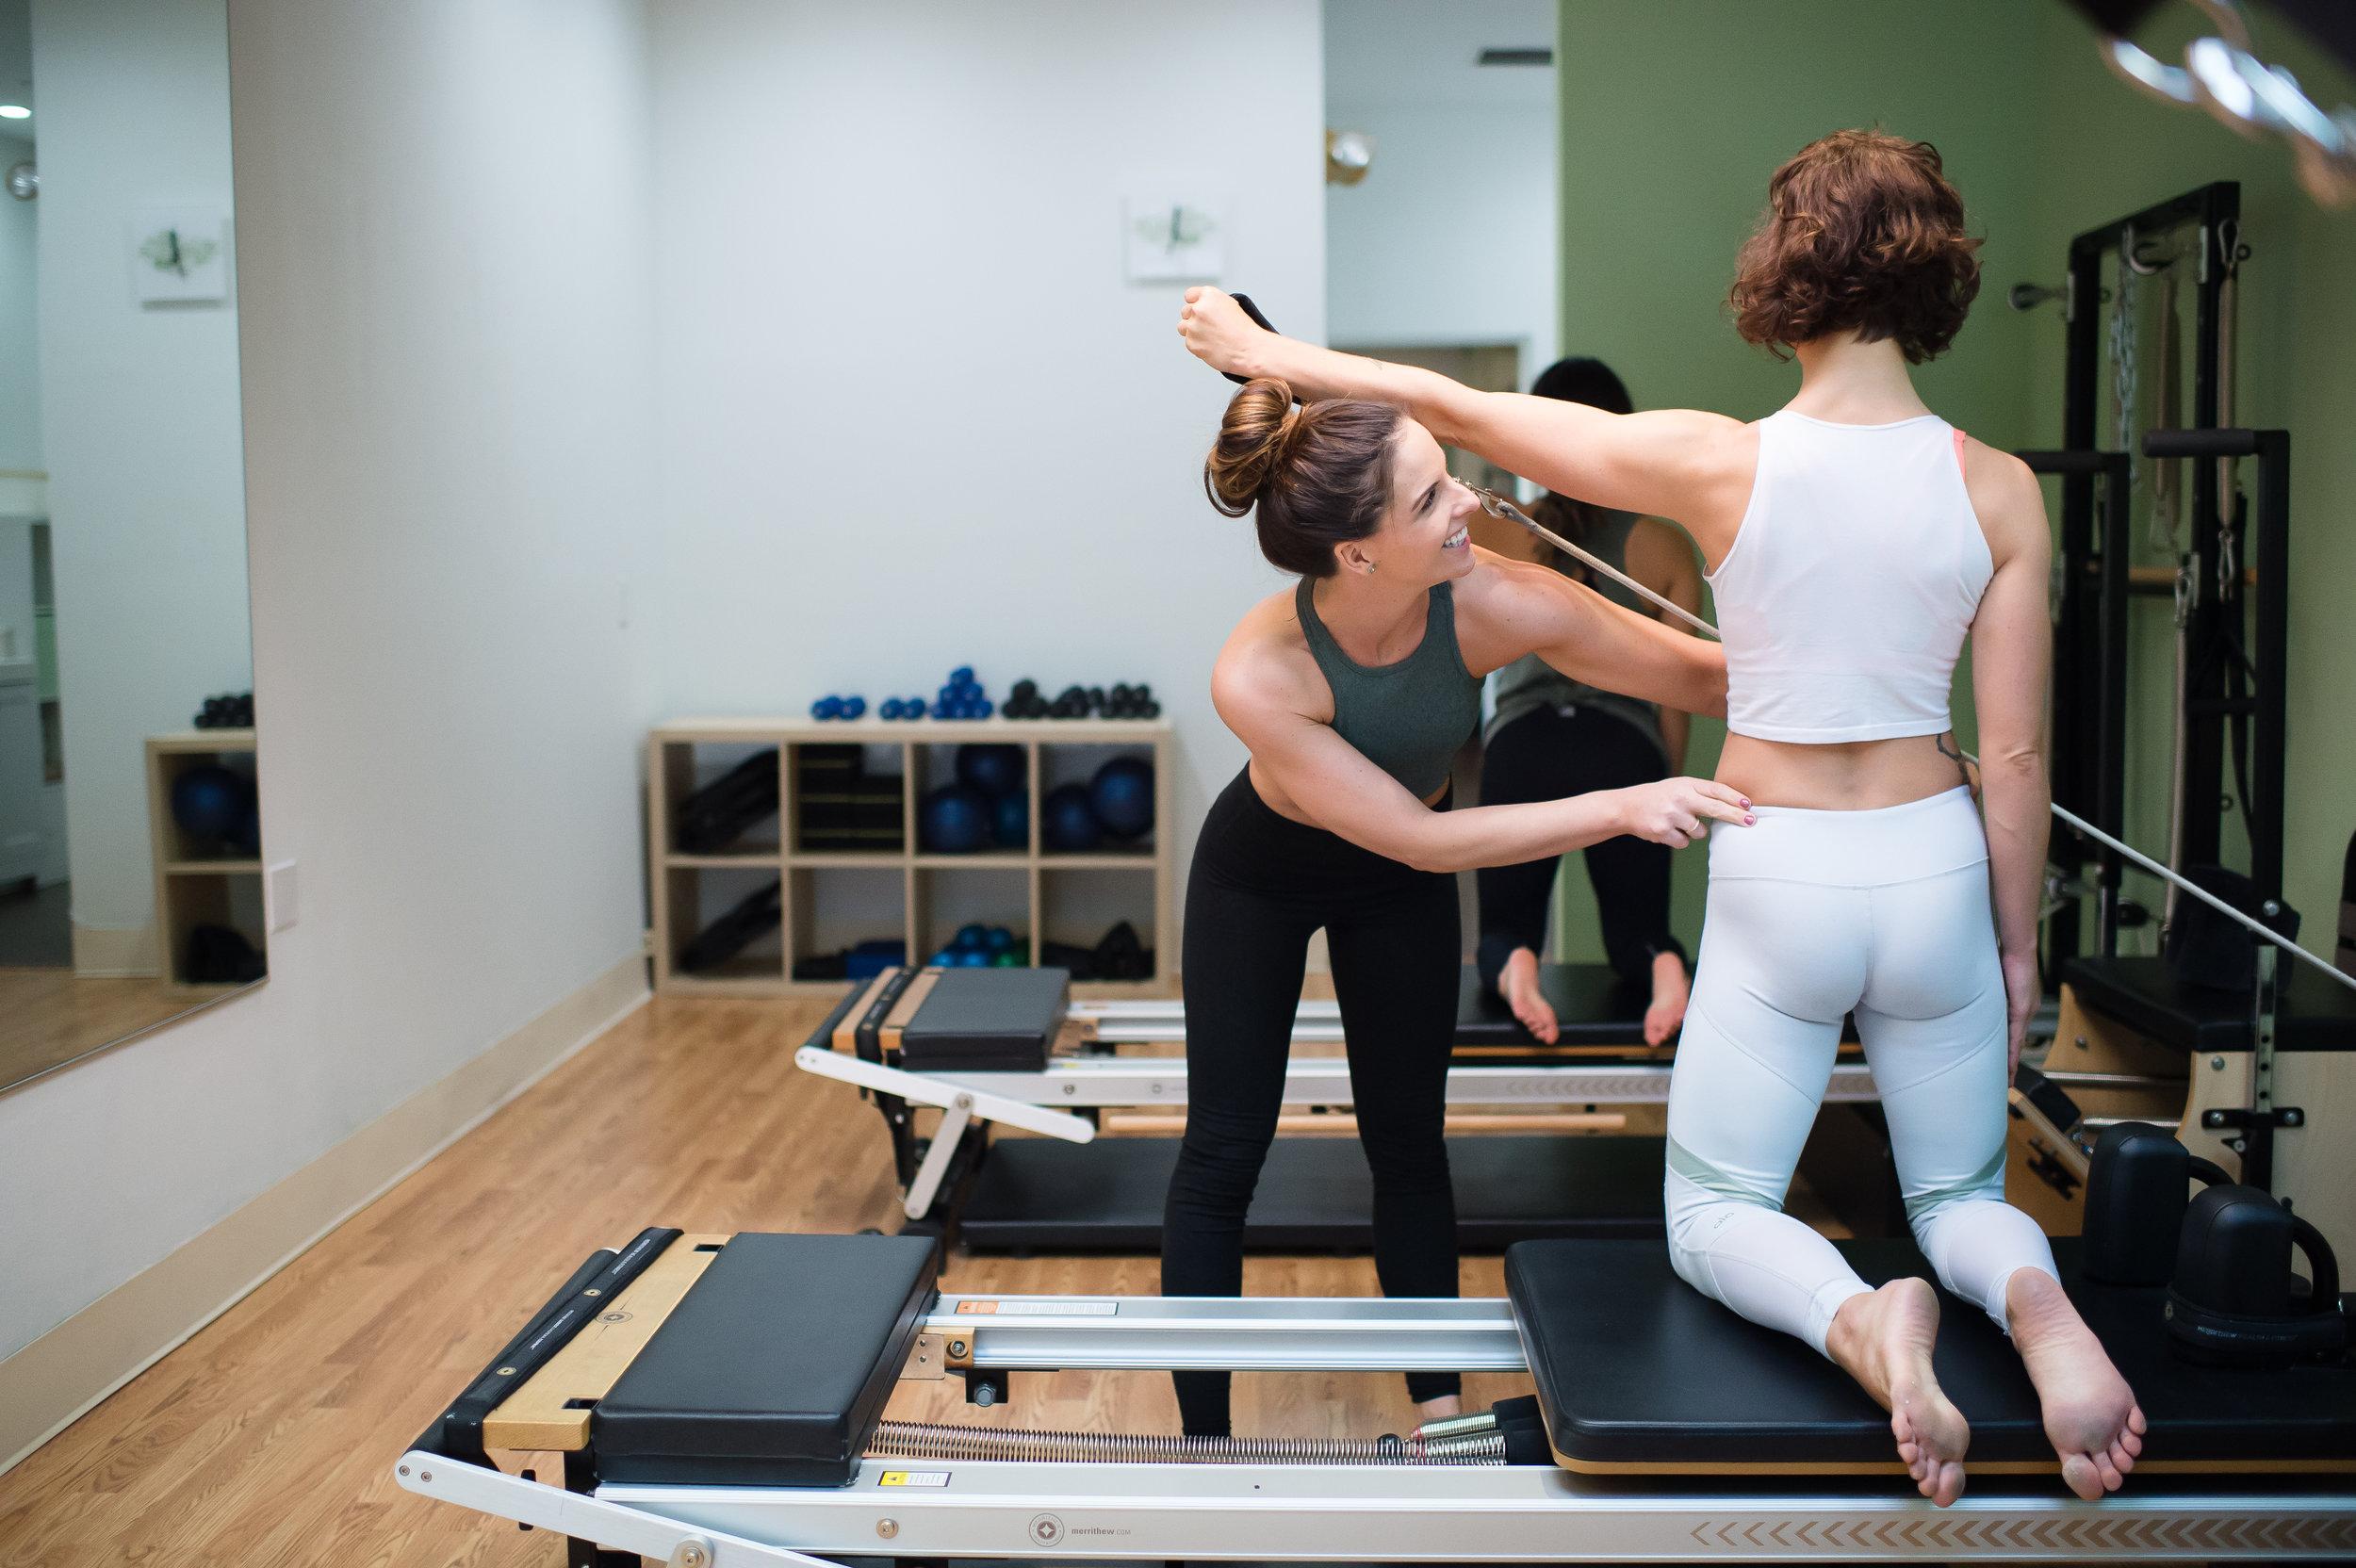 Chloe-Jackman-Photography-Pilates-Images-2017-126.jpg